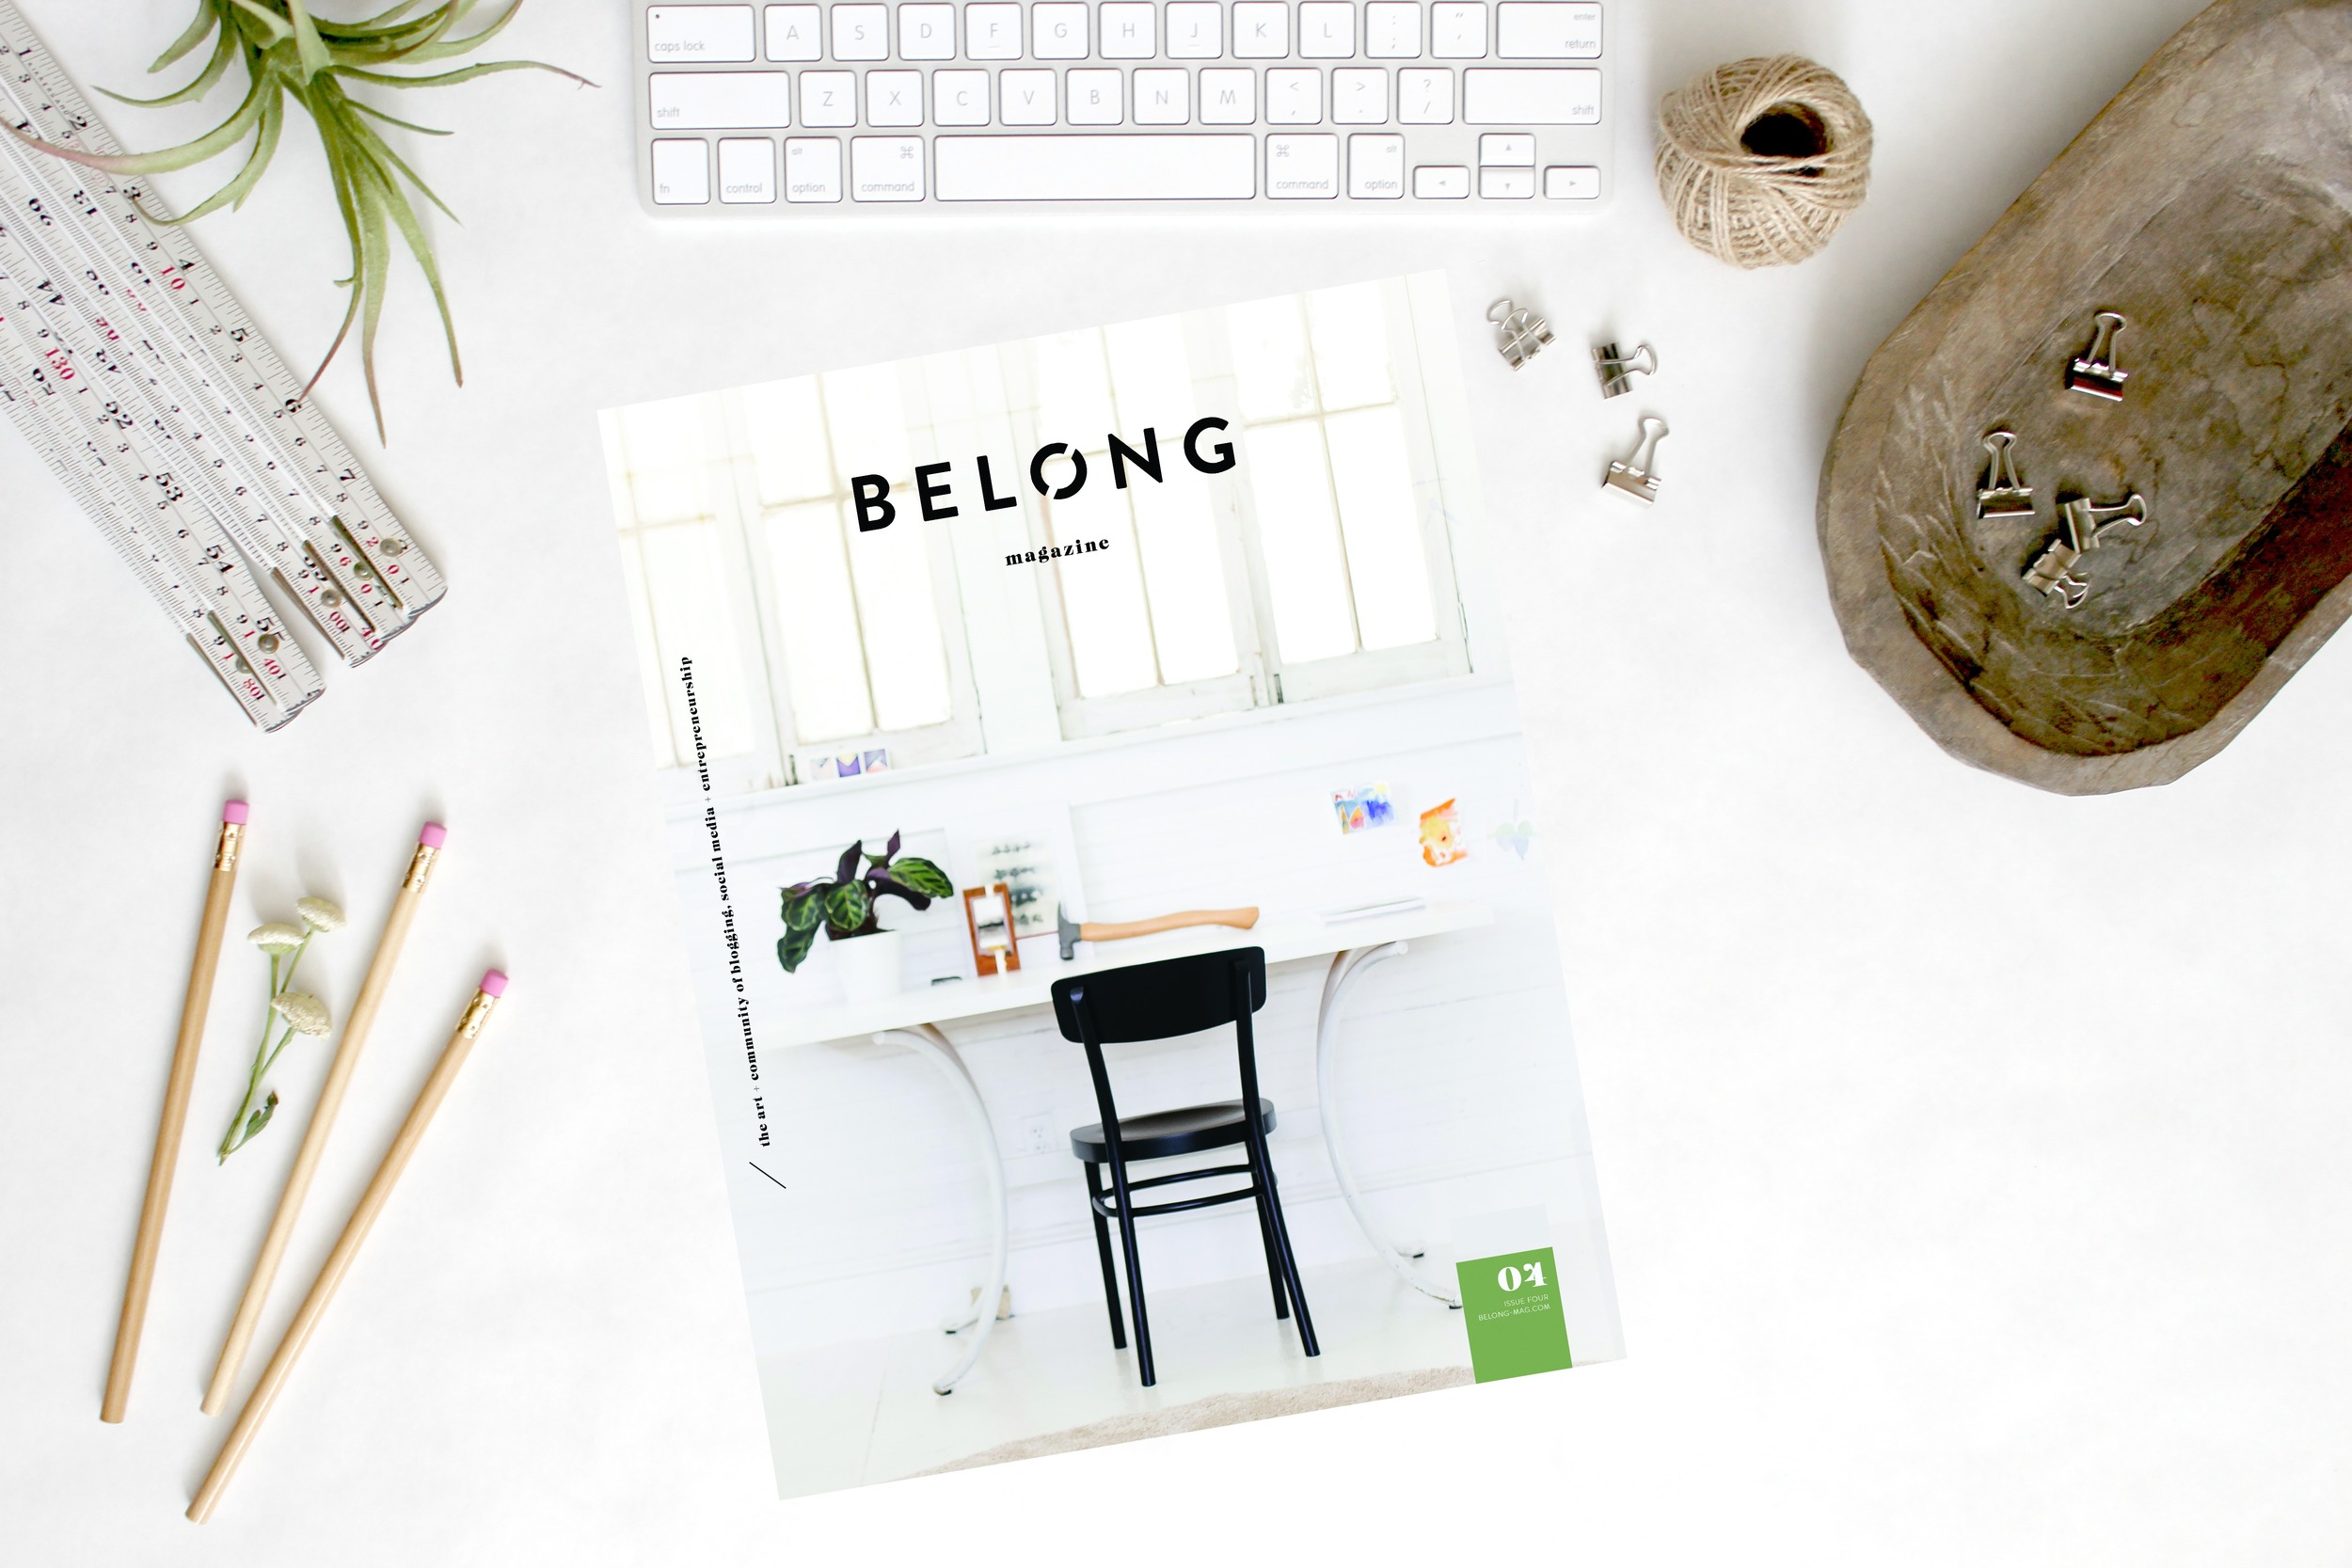 belong magazine issue 04 cover desktop 2